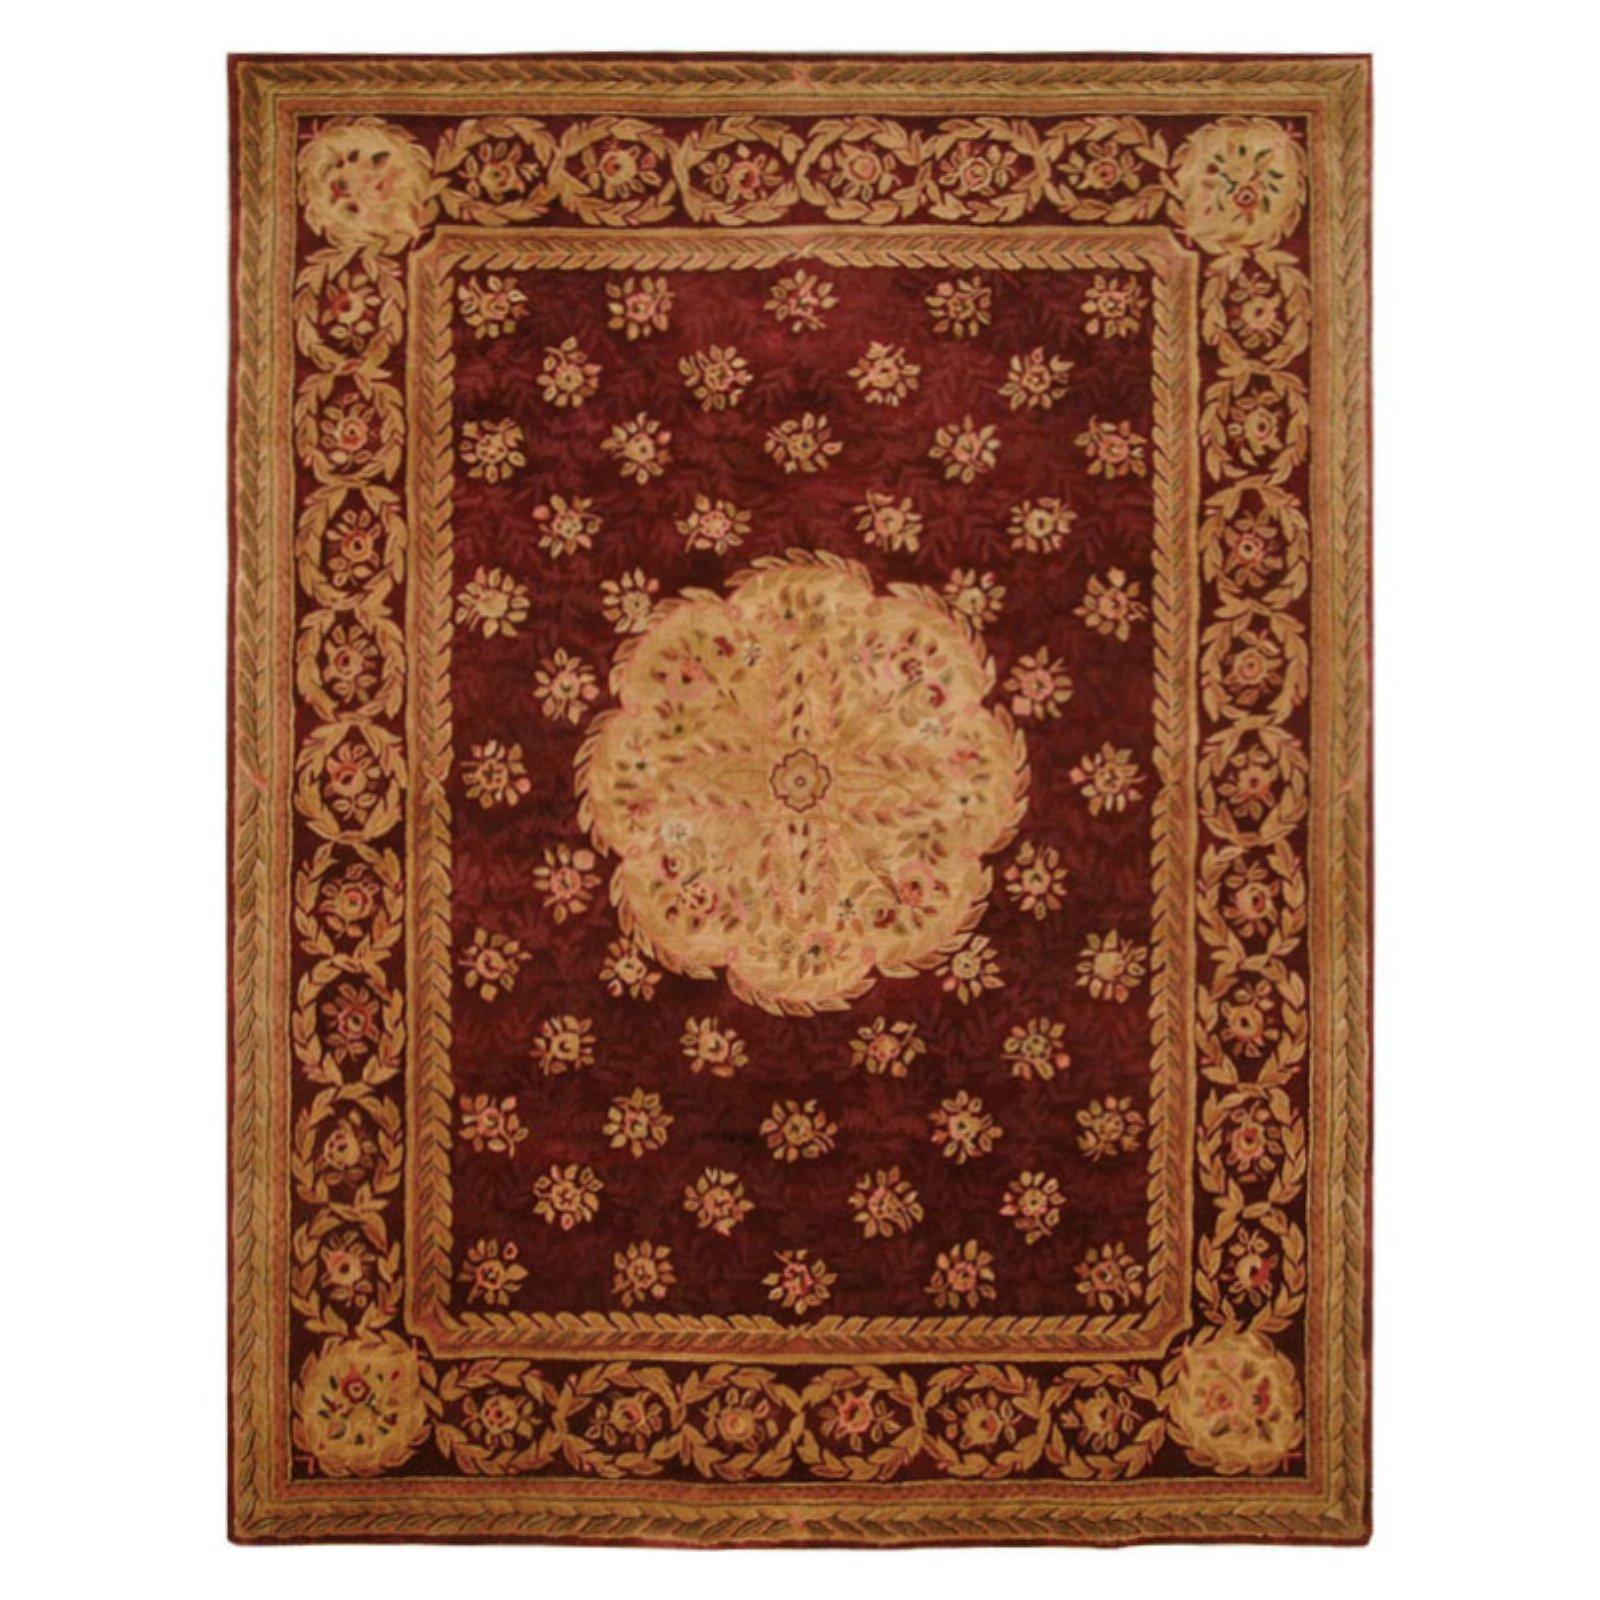 Safavieh Empire Hand Tufted Wool Runner Rug